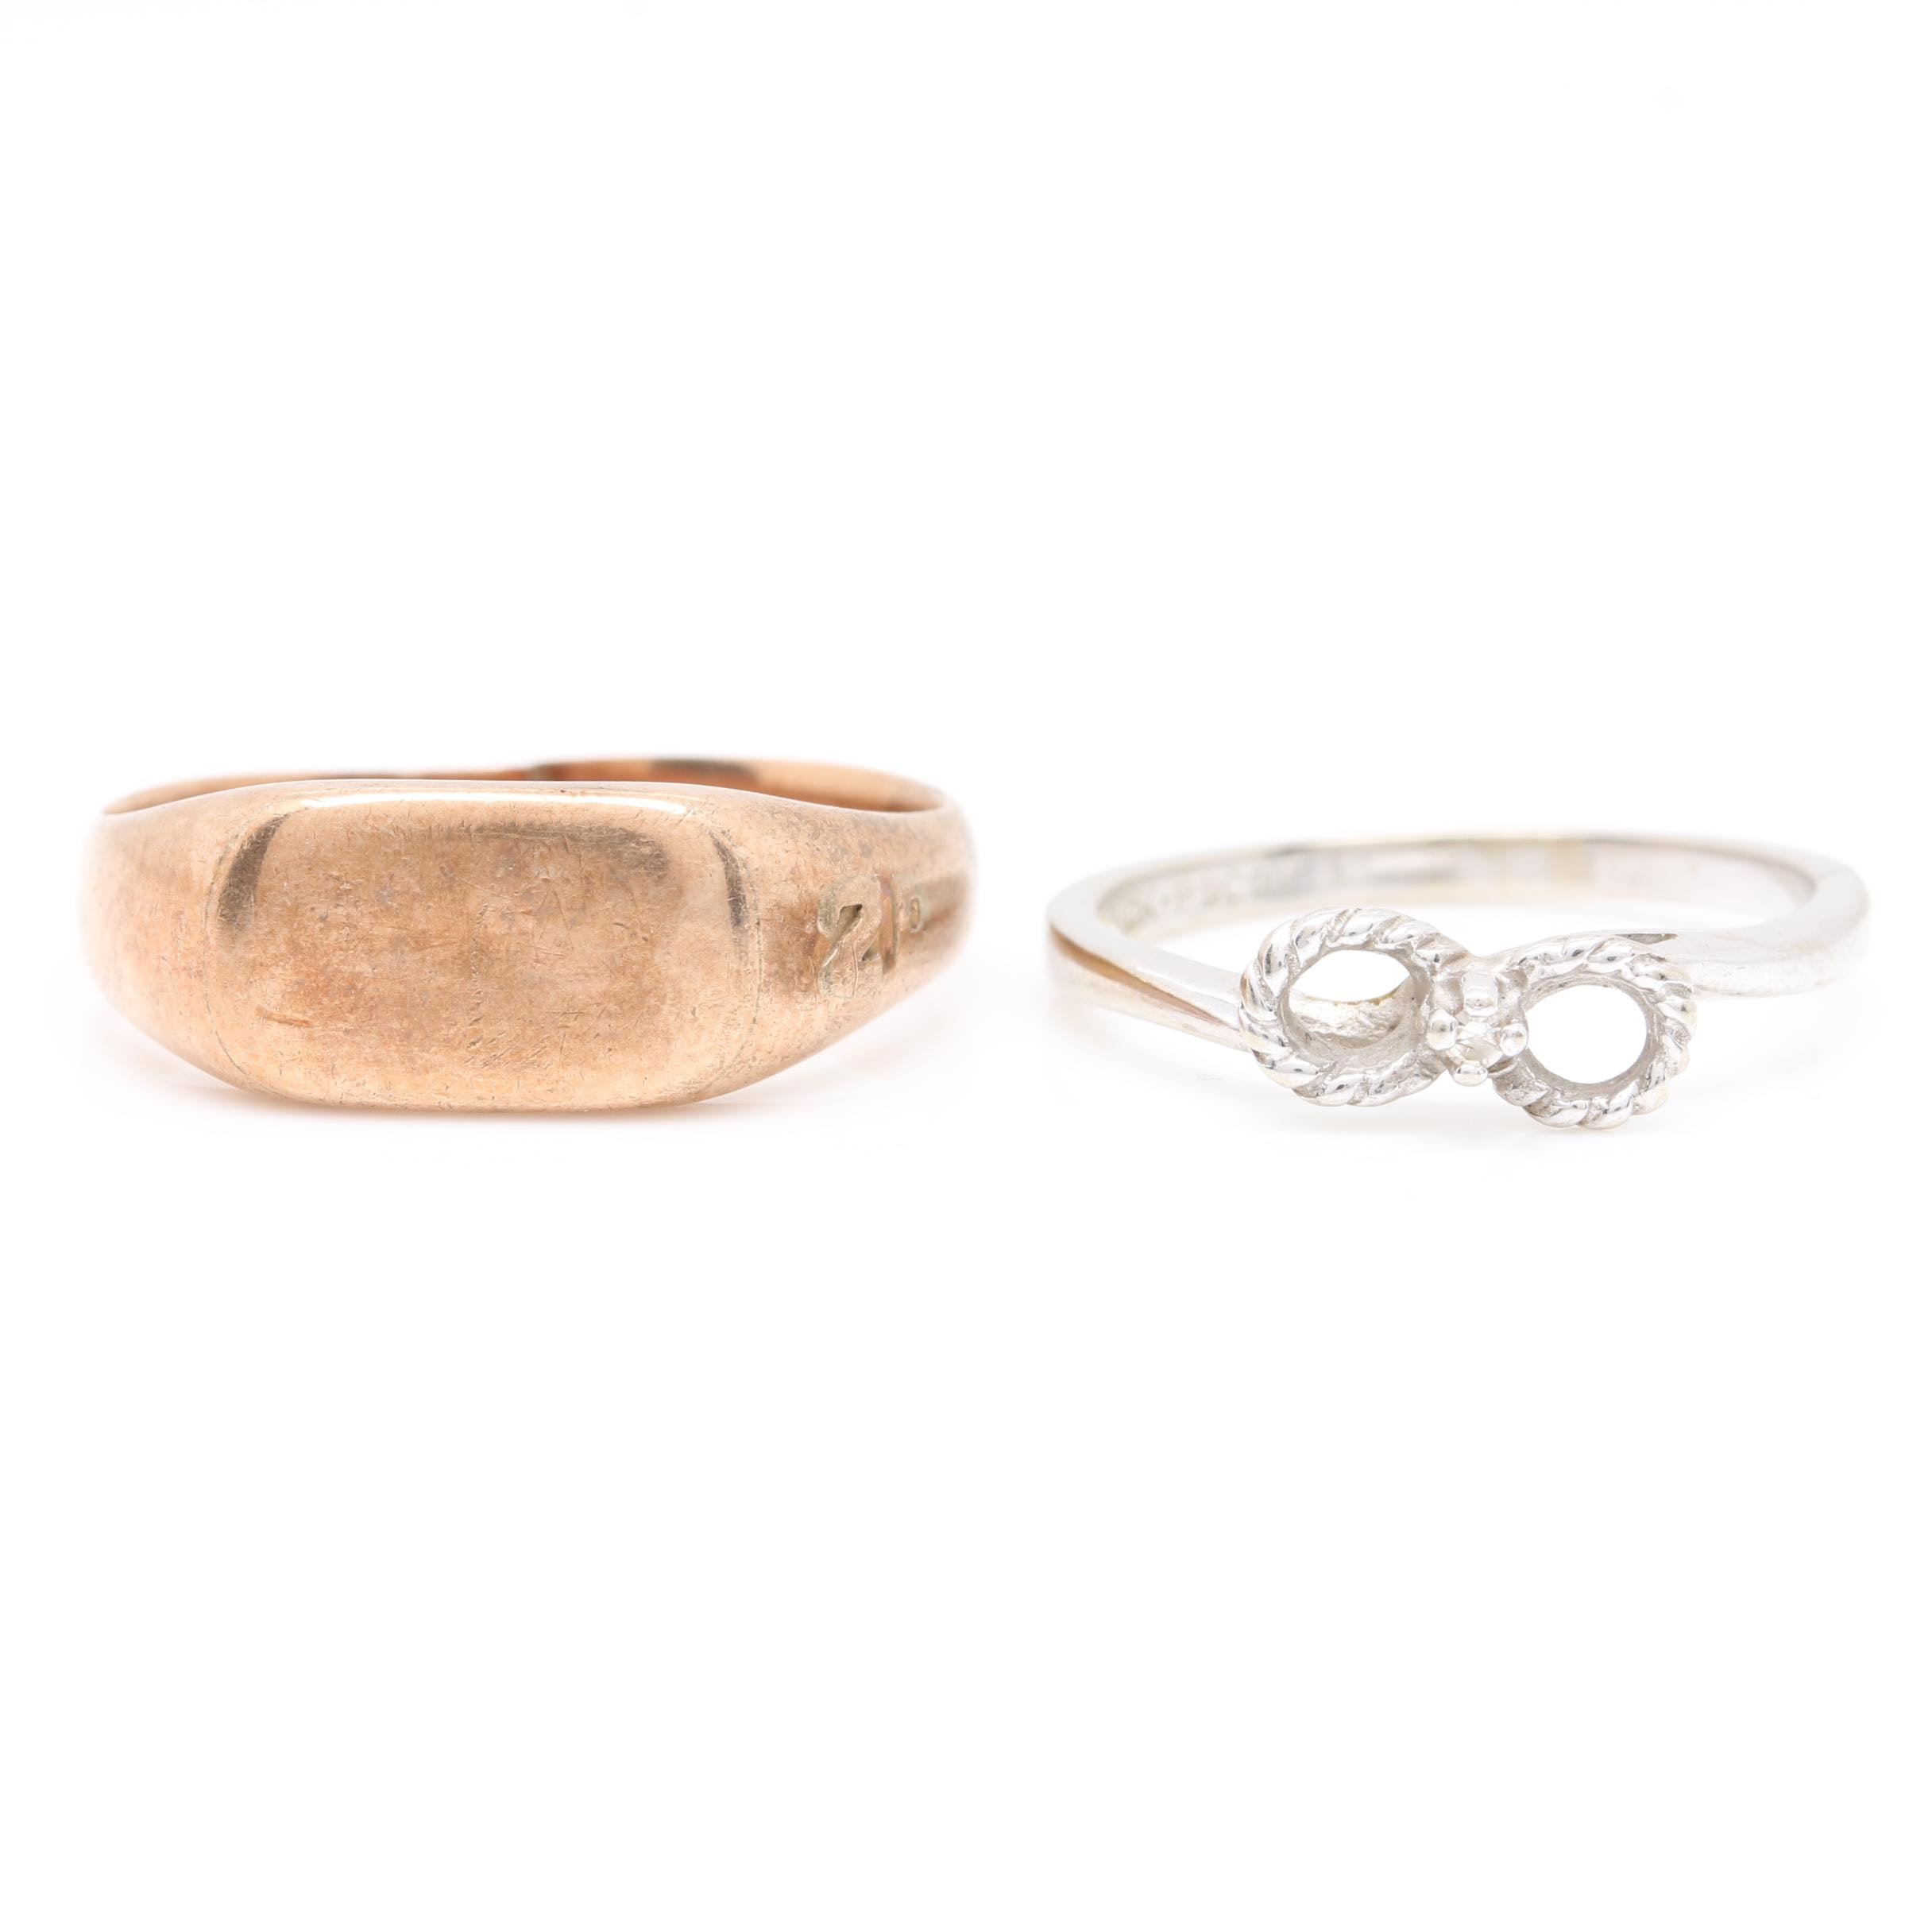 10K Yellow Gold Signet Ring and 10K White Gold Diamond Ring